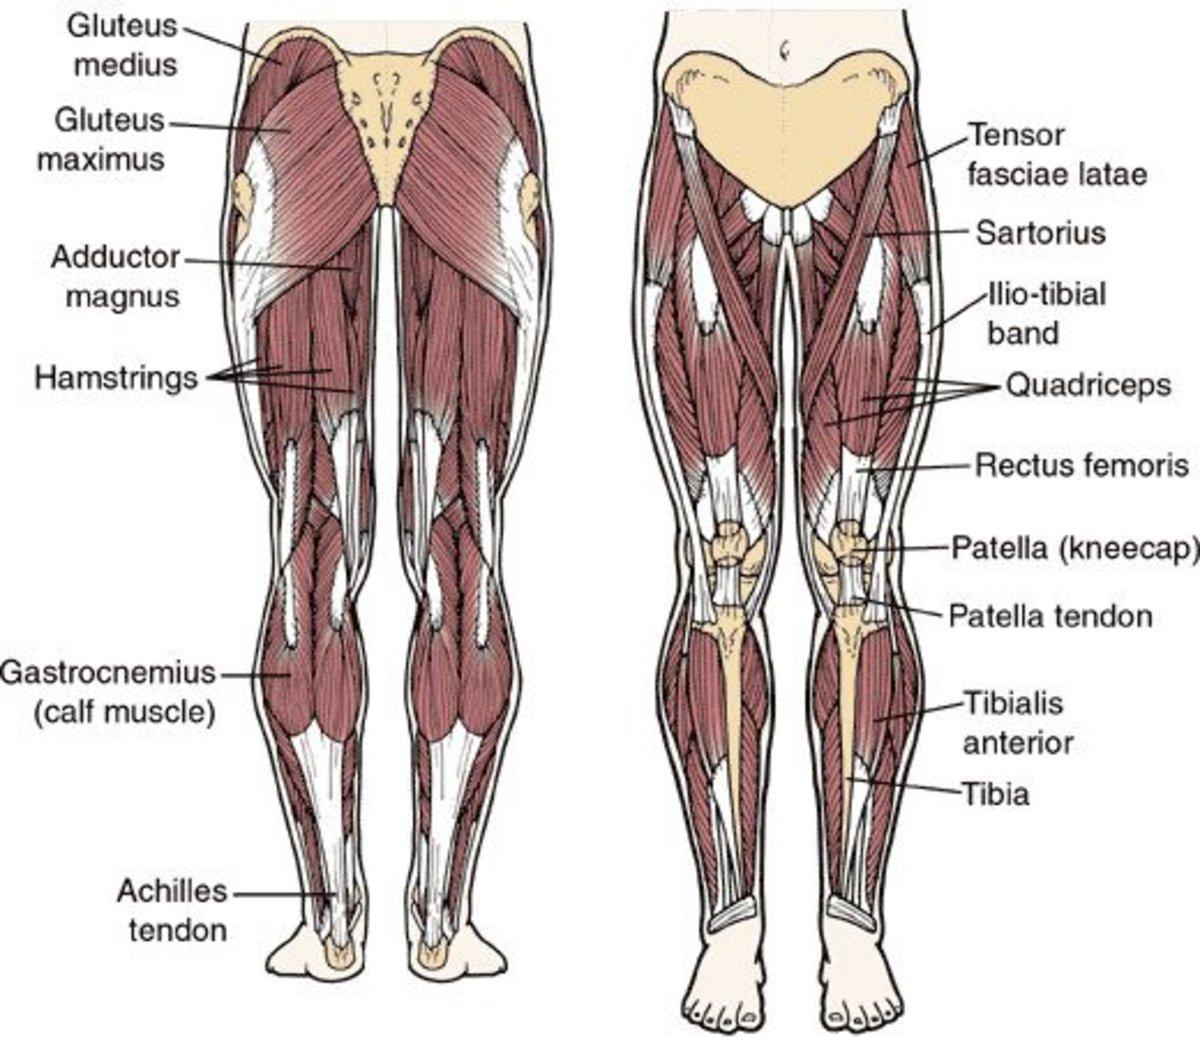 Anatomy of the legs